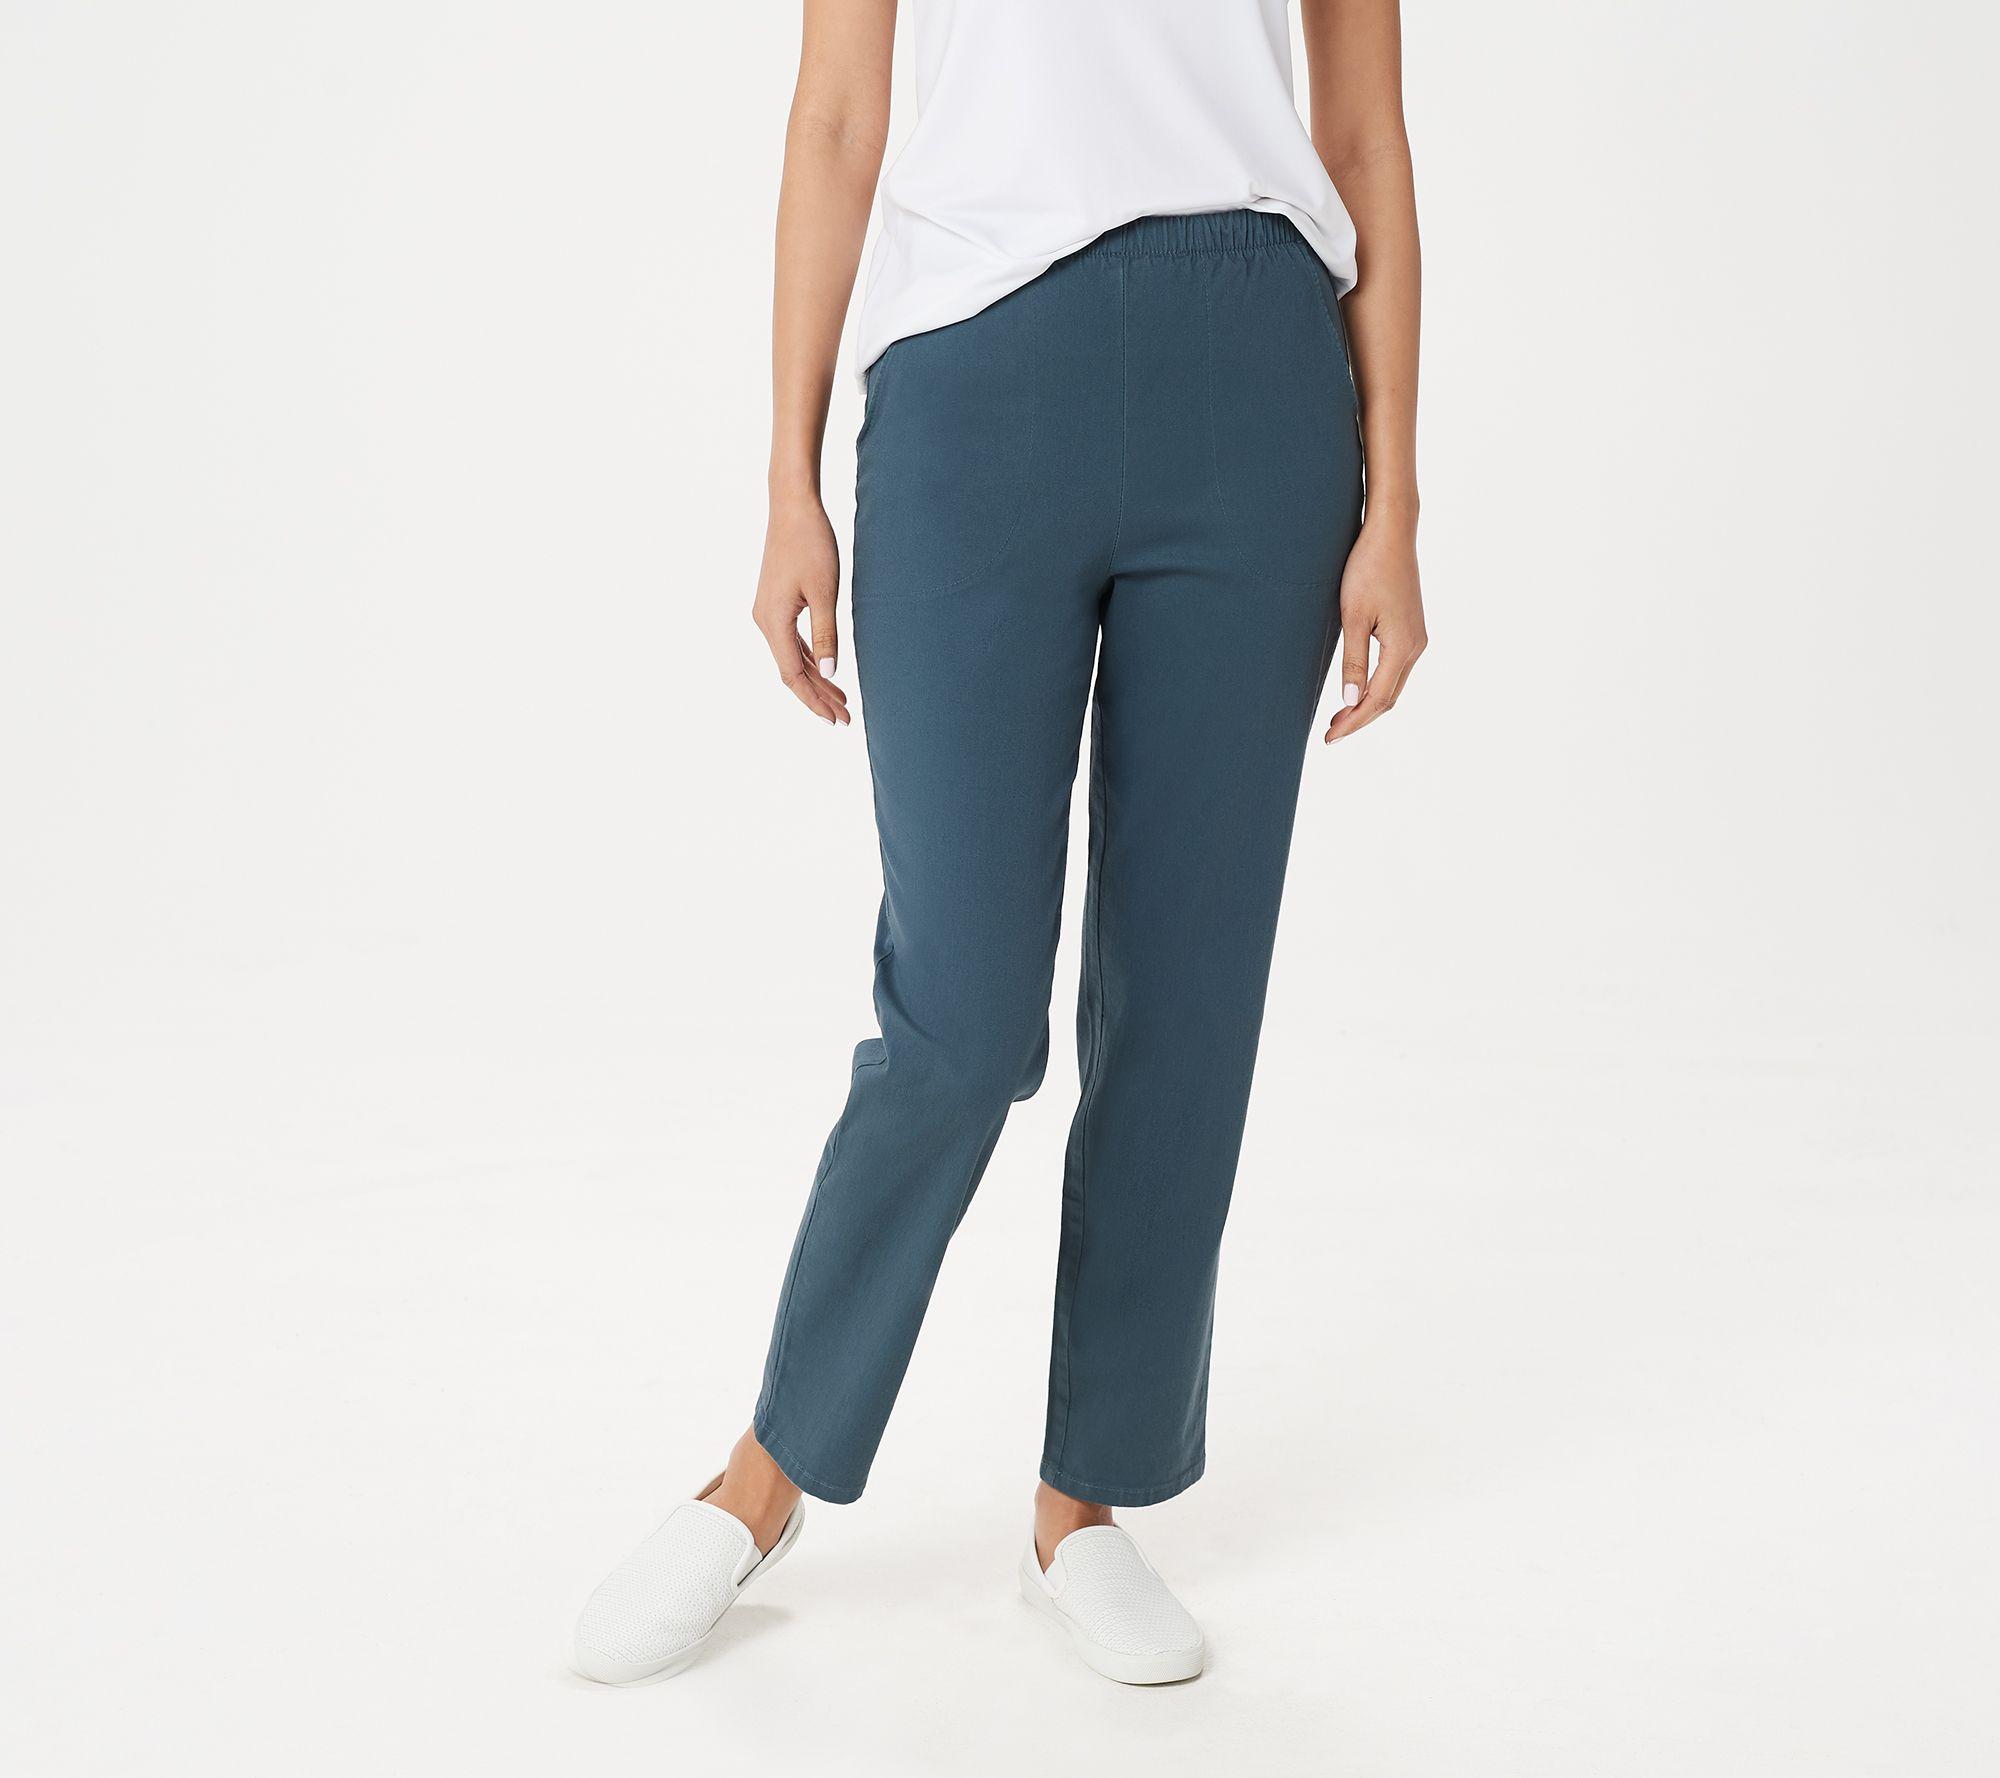 46af8a6a831324 Original Waist Stretch Regular Pants w/ Side Pockets - Page 1 — QVC.com